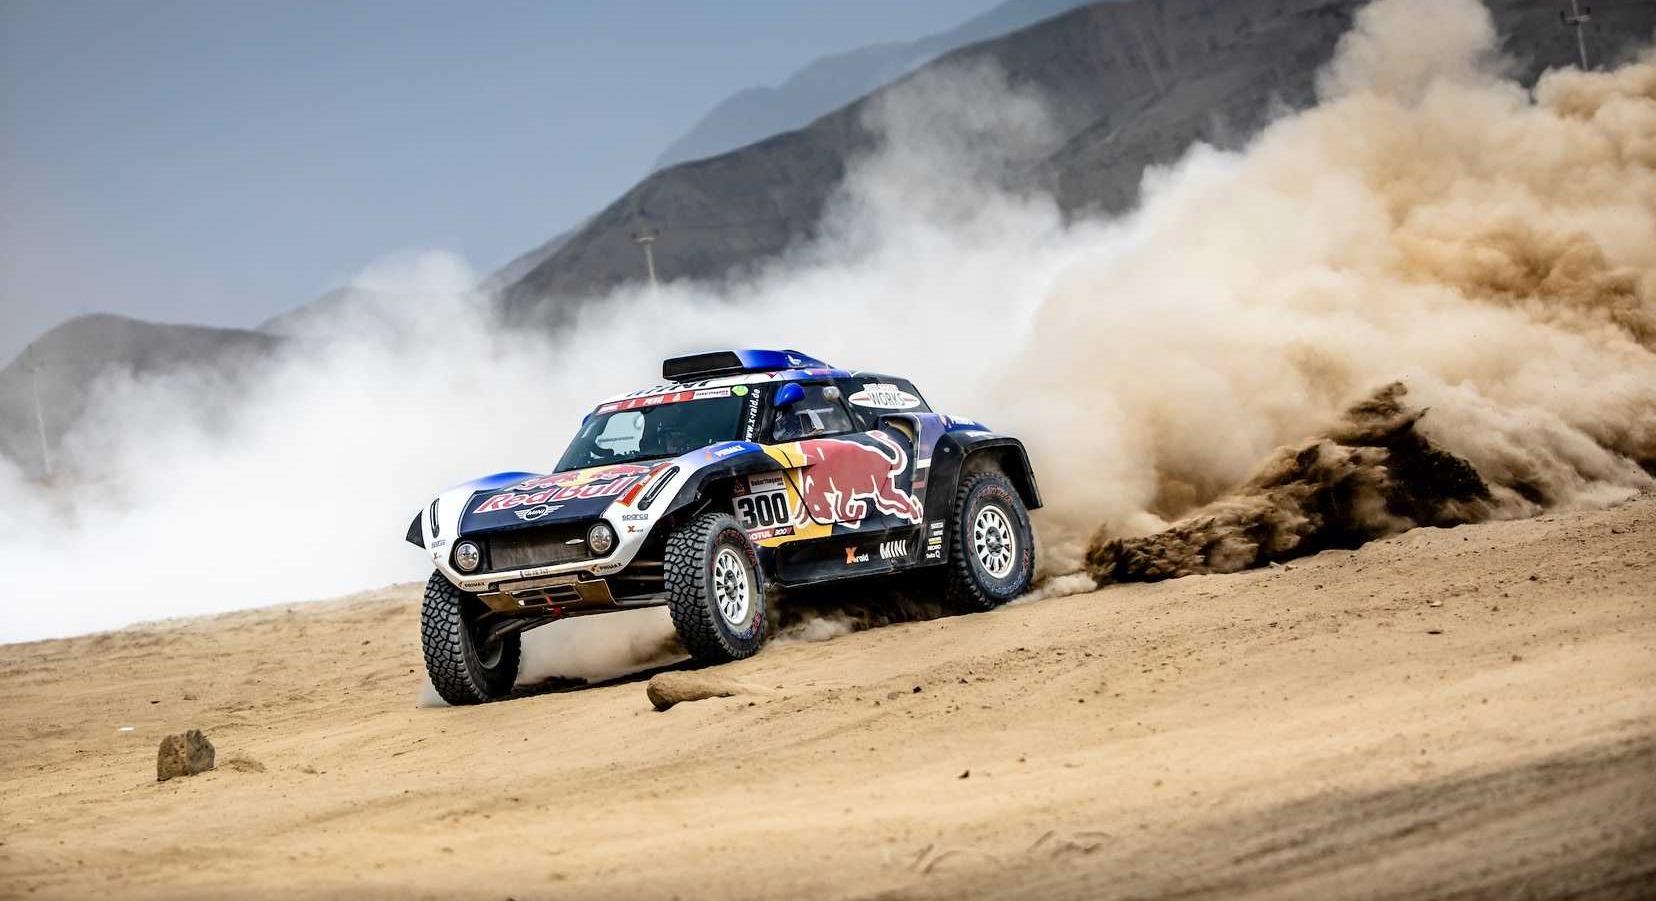 dakar rally car racing across sand dunes